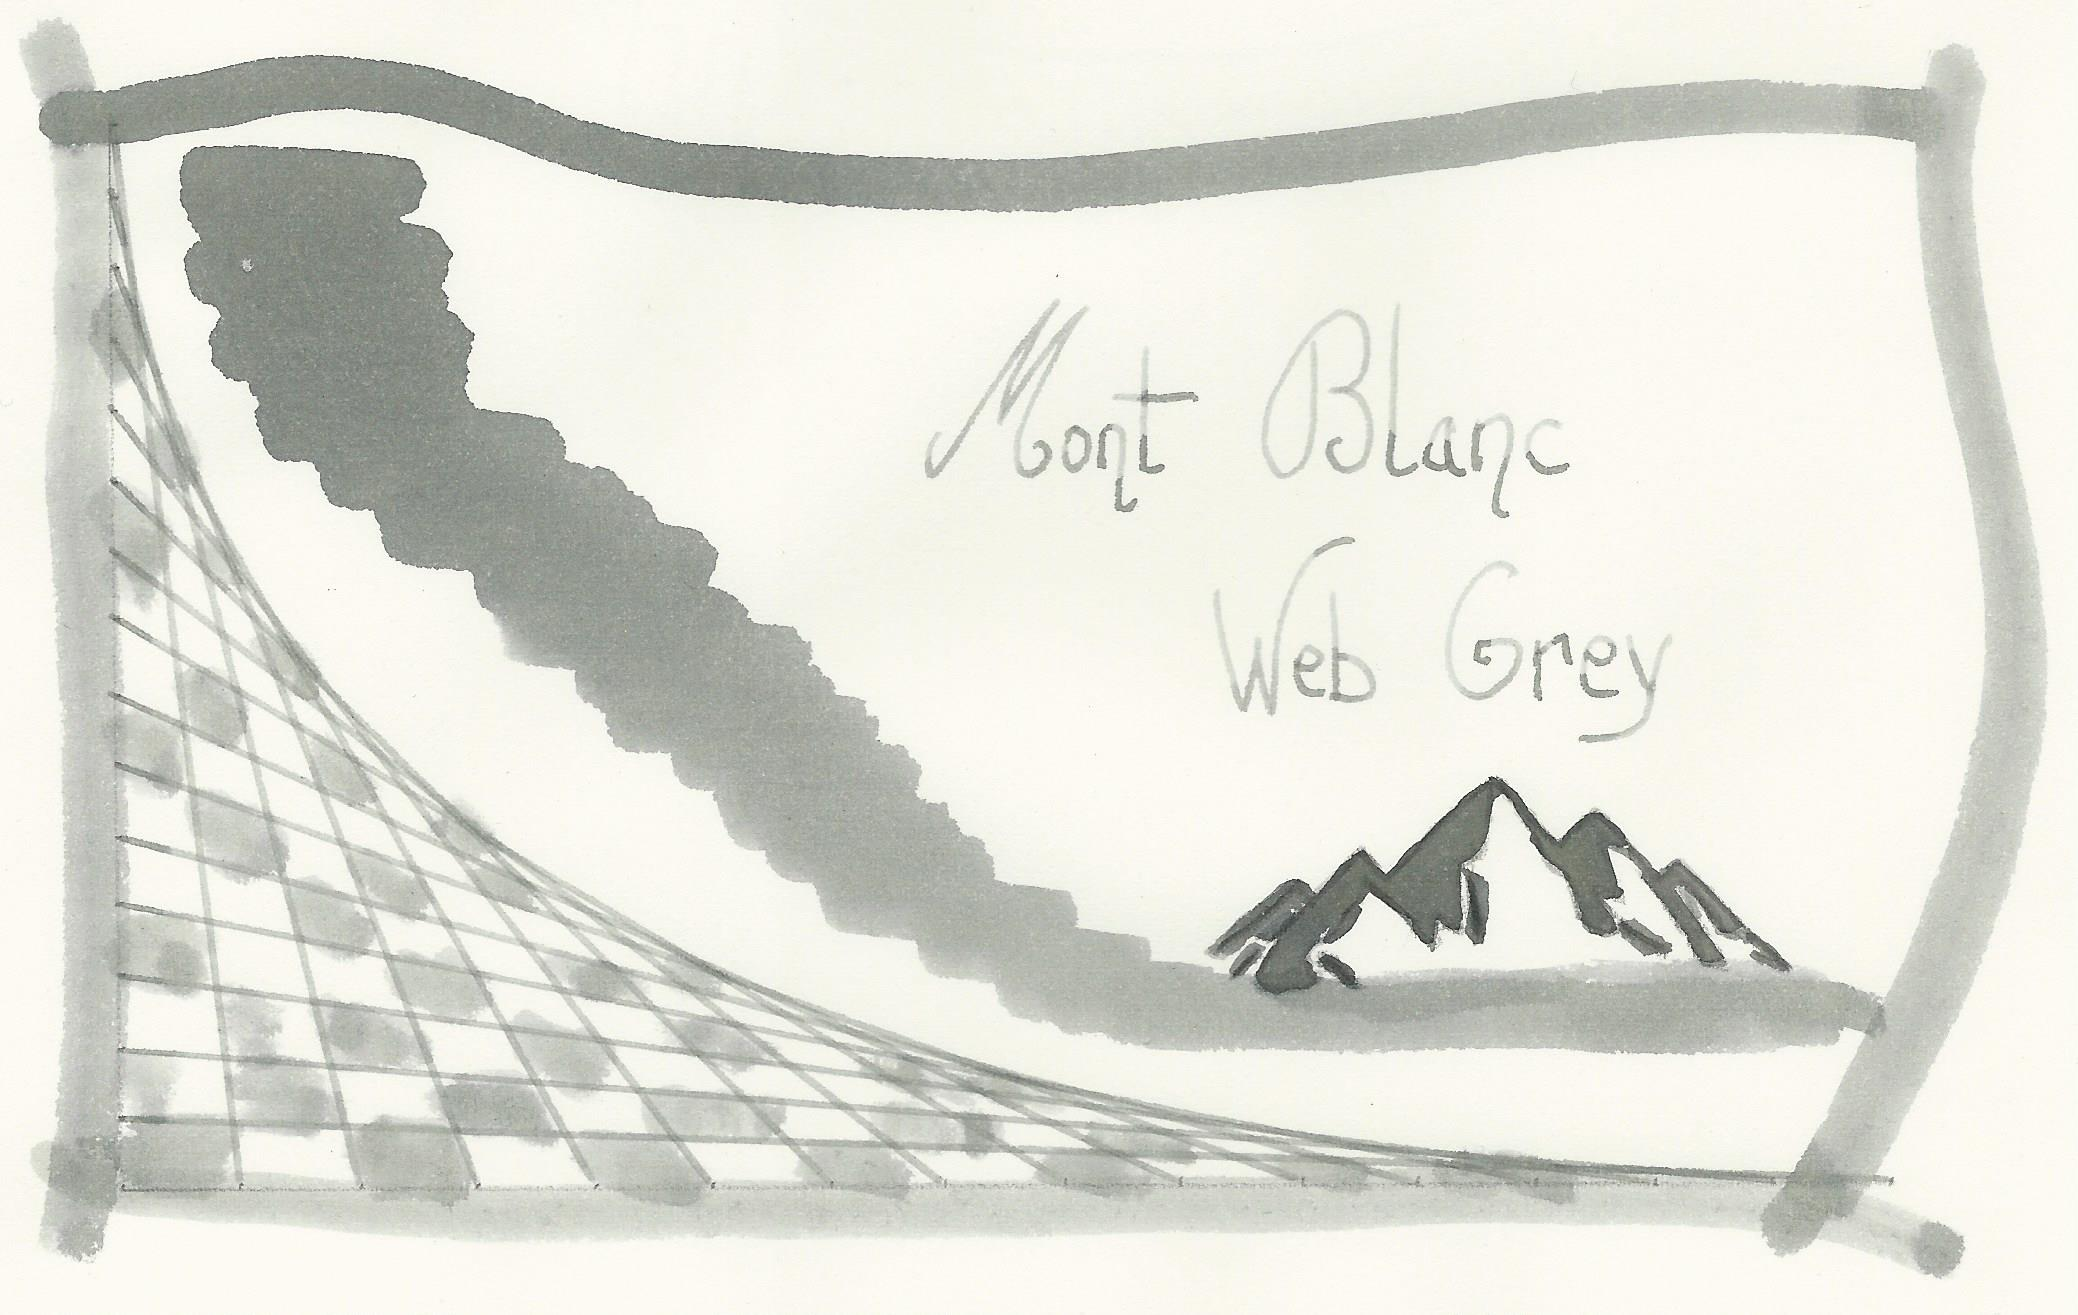 fpn_1537626097__mont_blanc_-_web_grey_-_